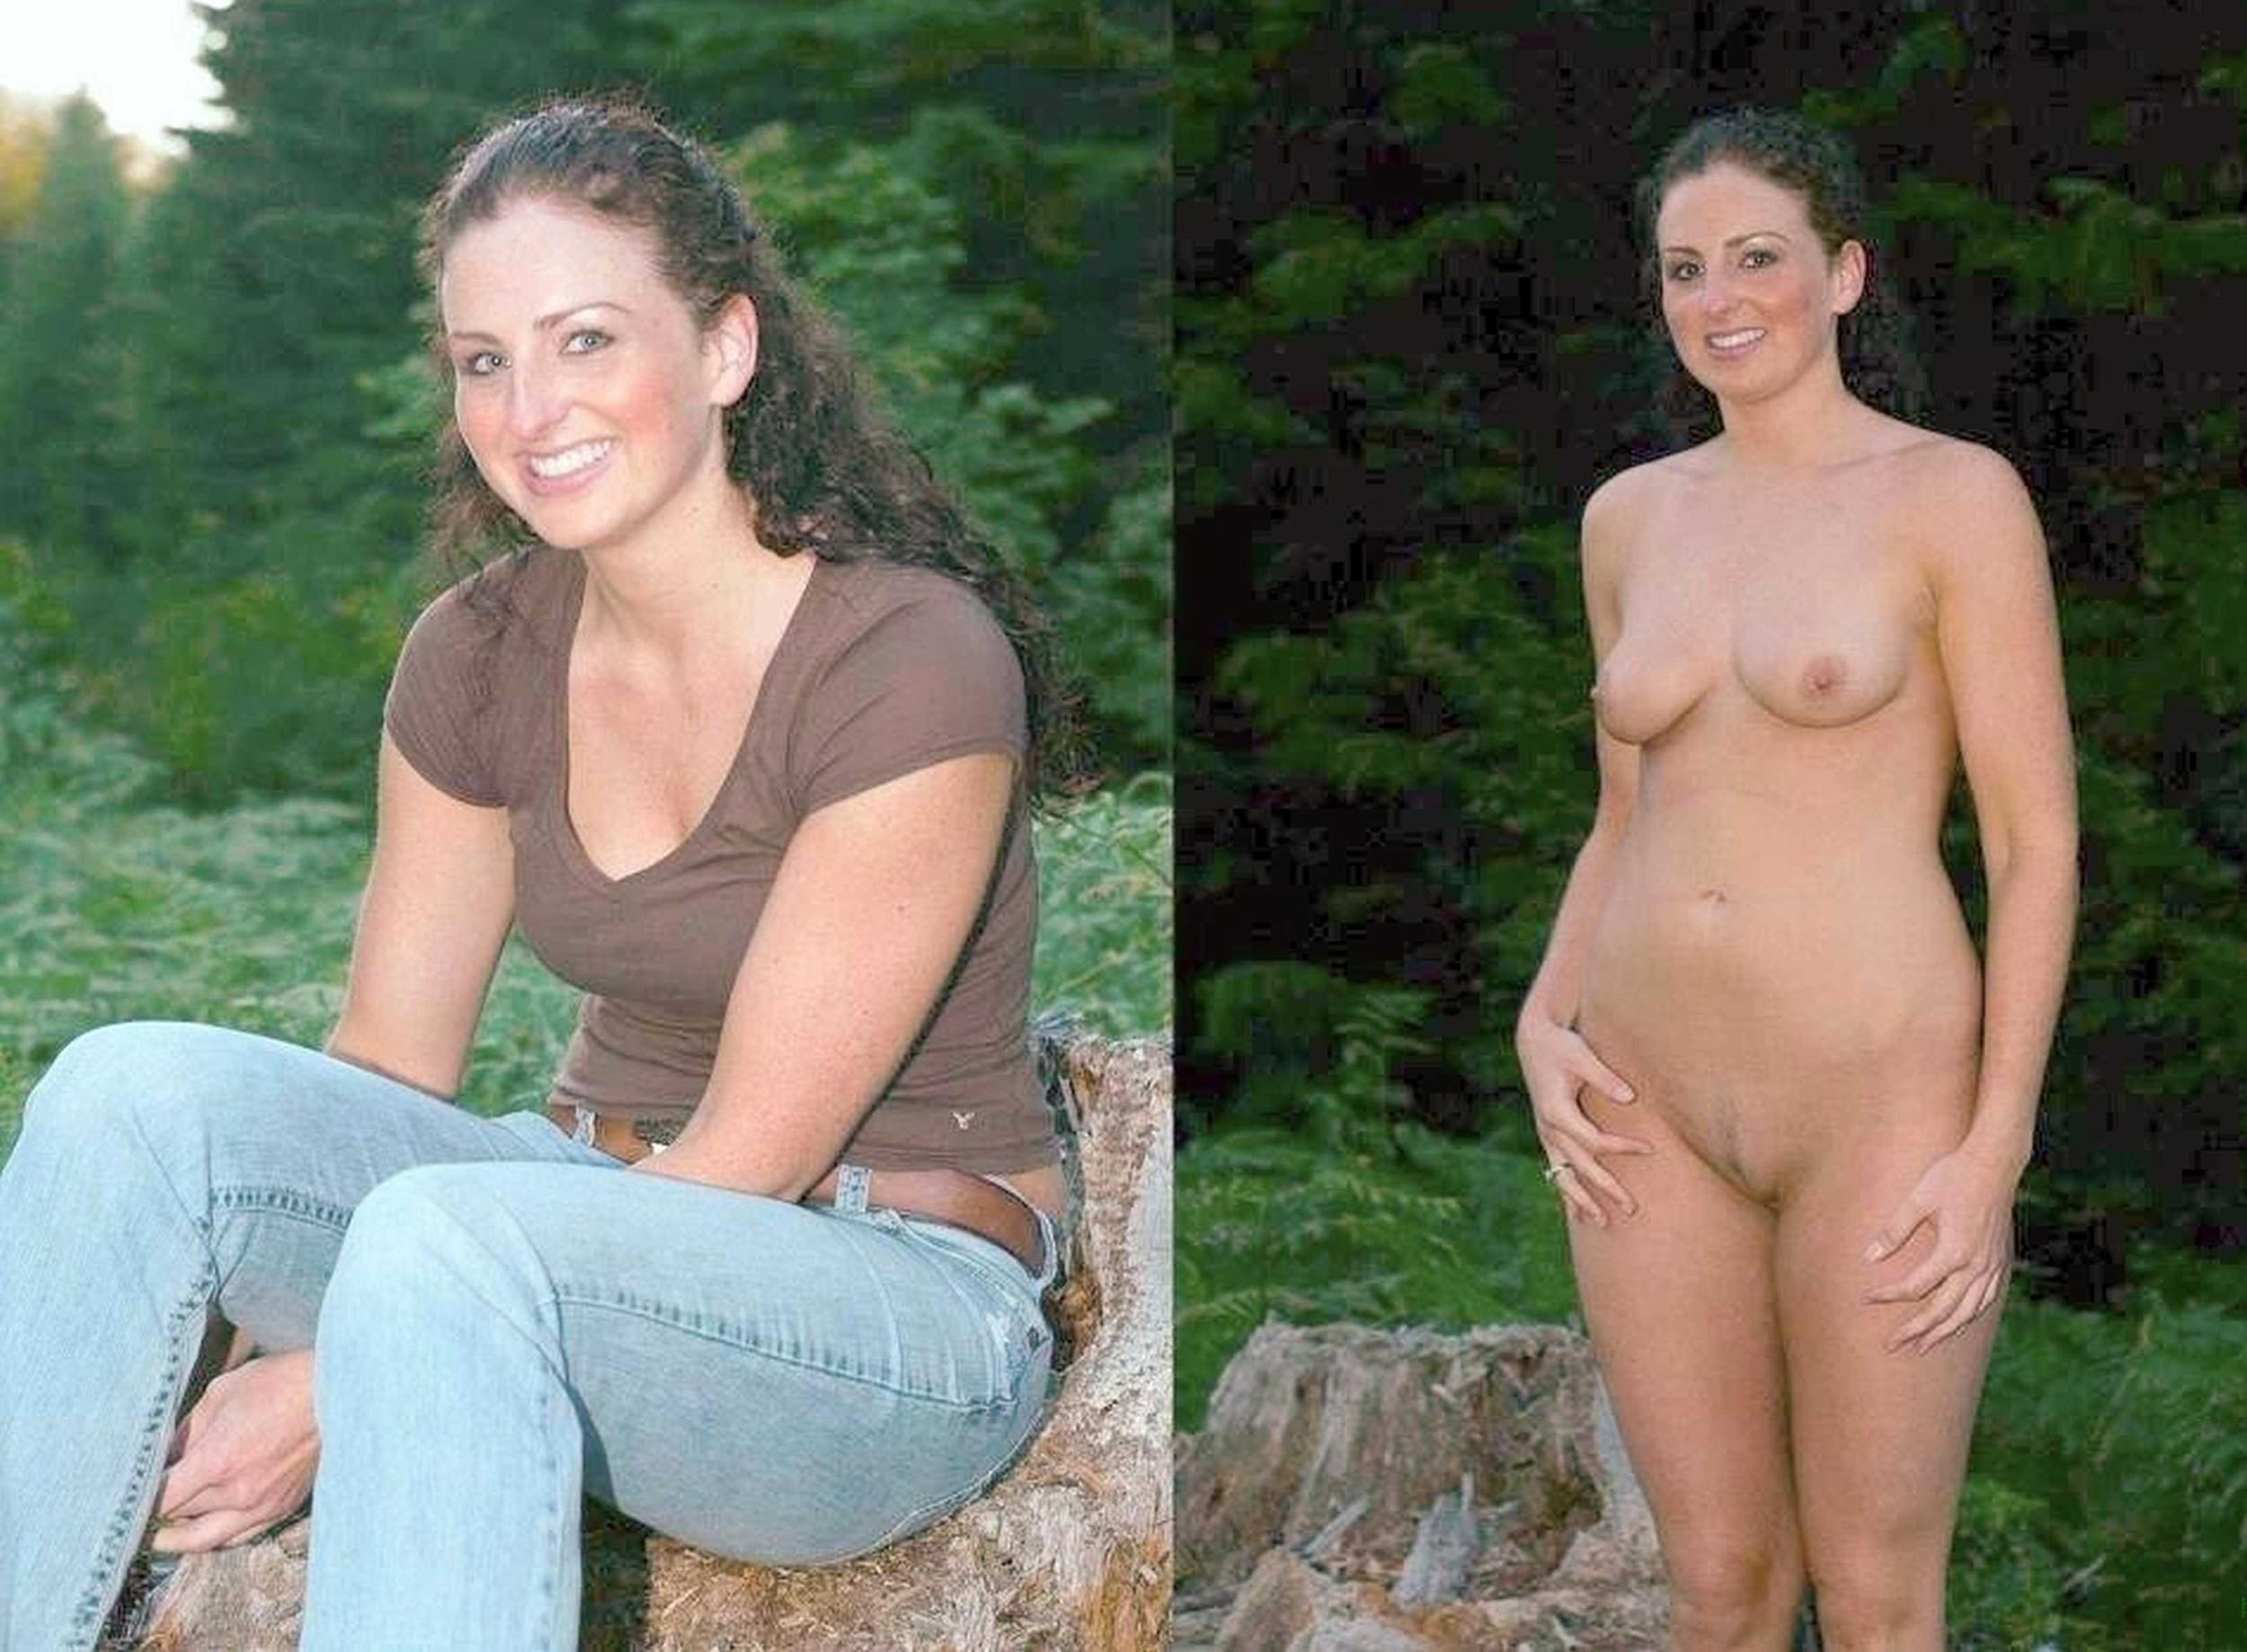 Dressed undressed amateur